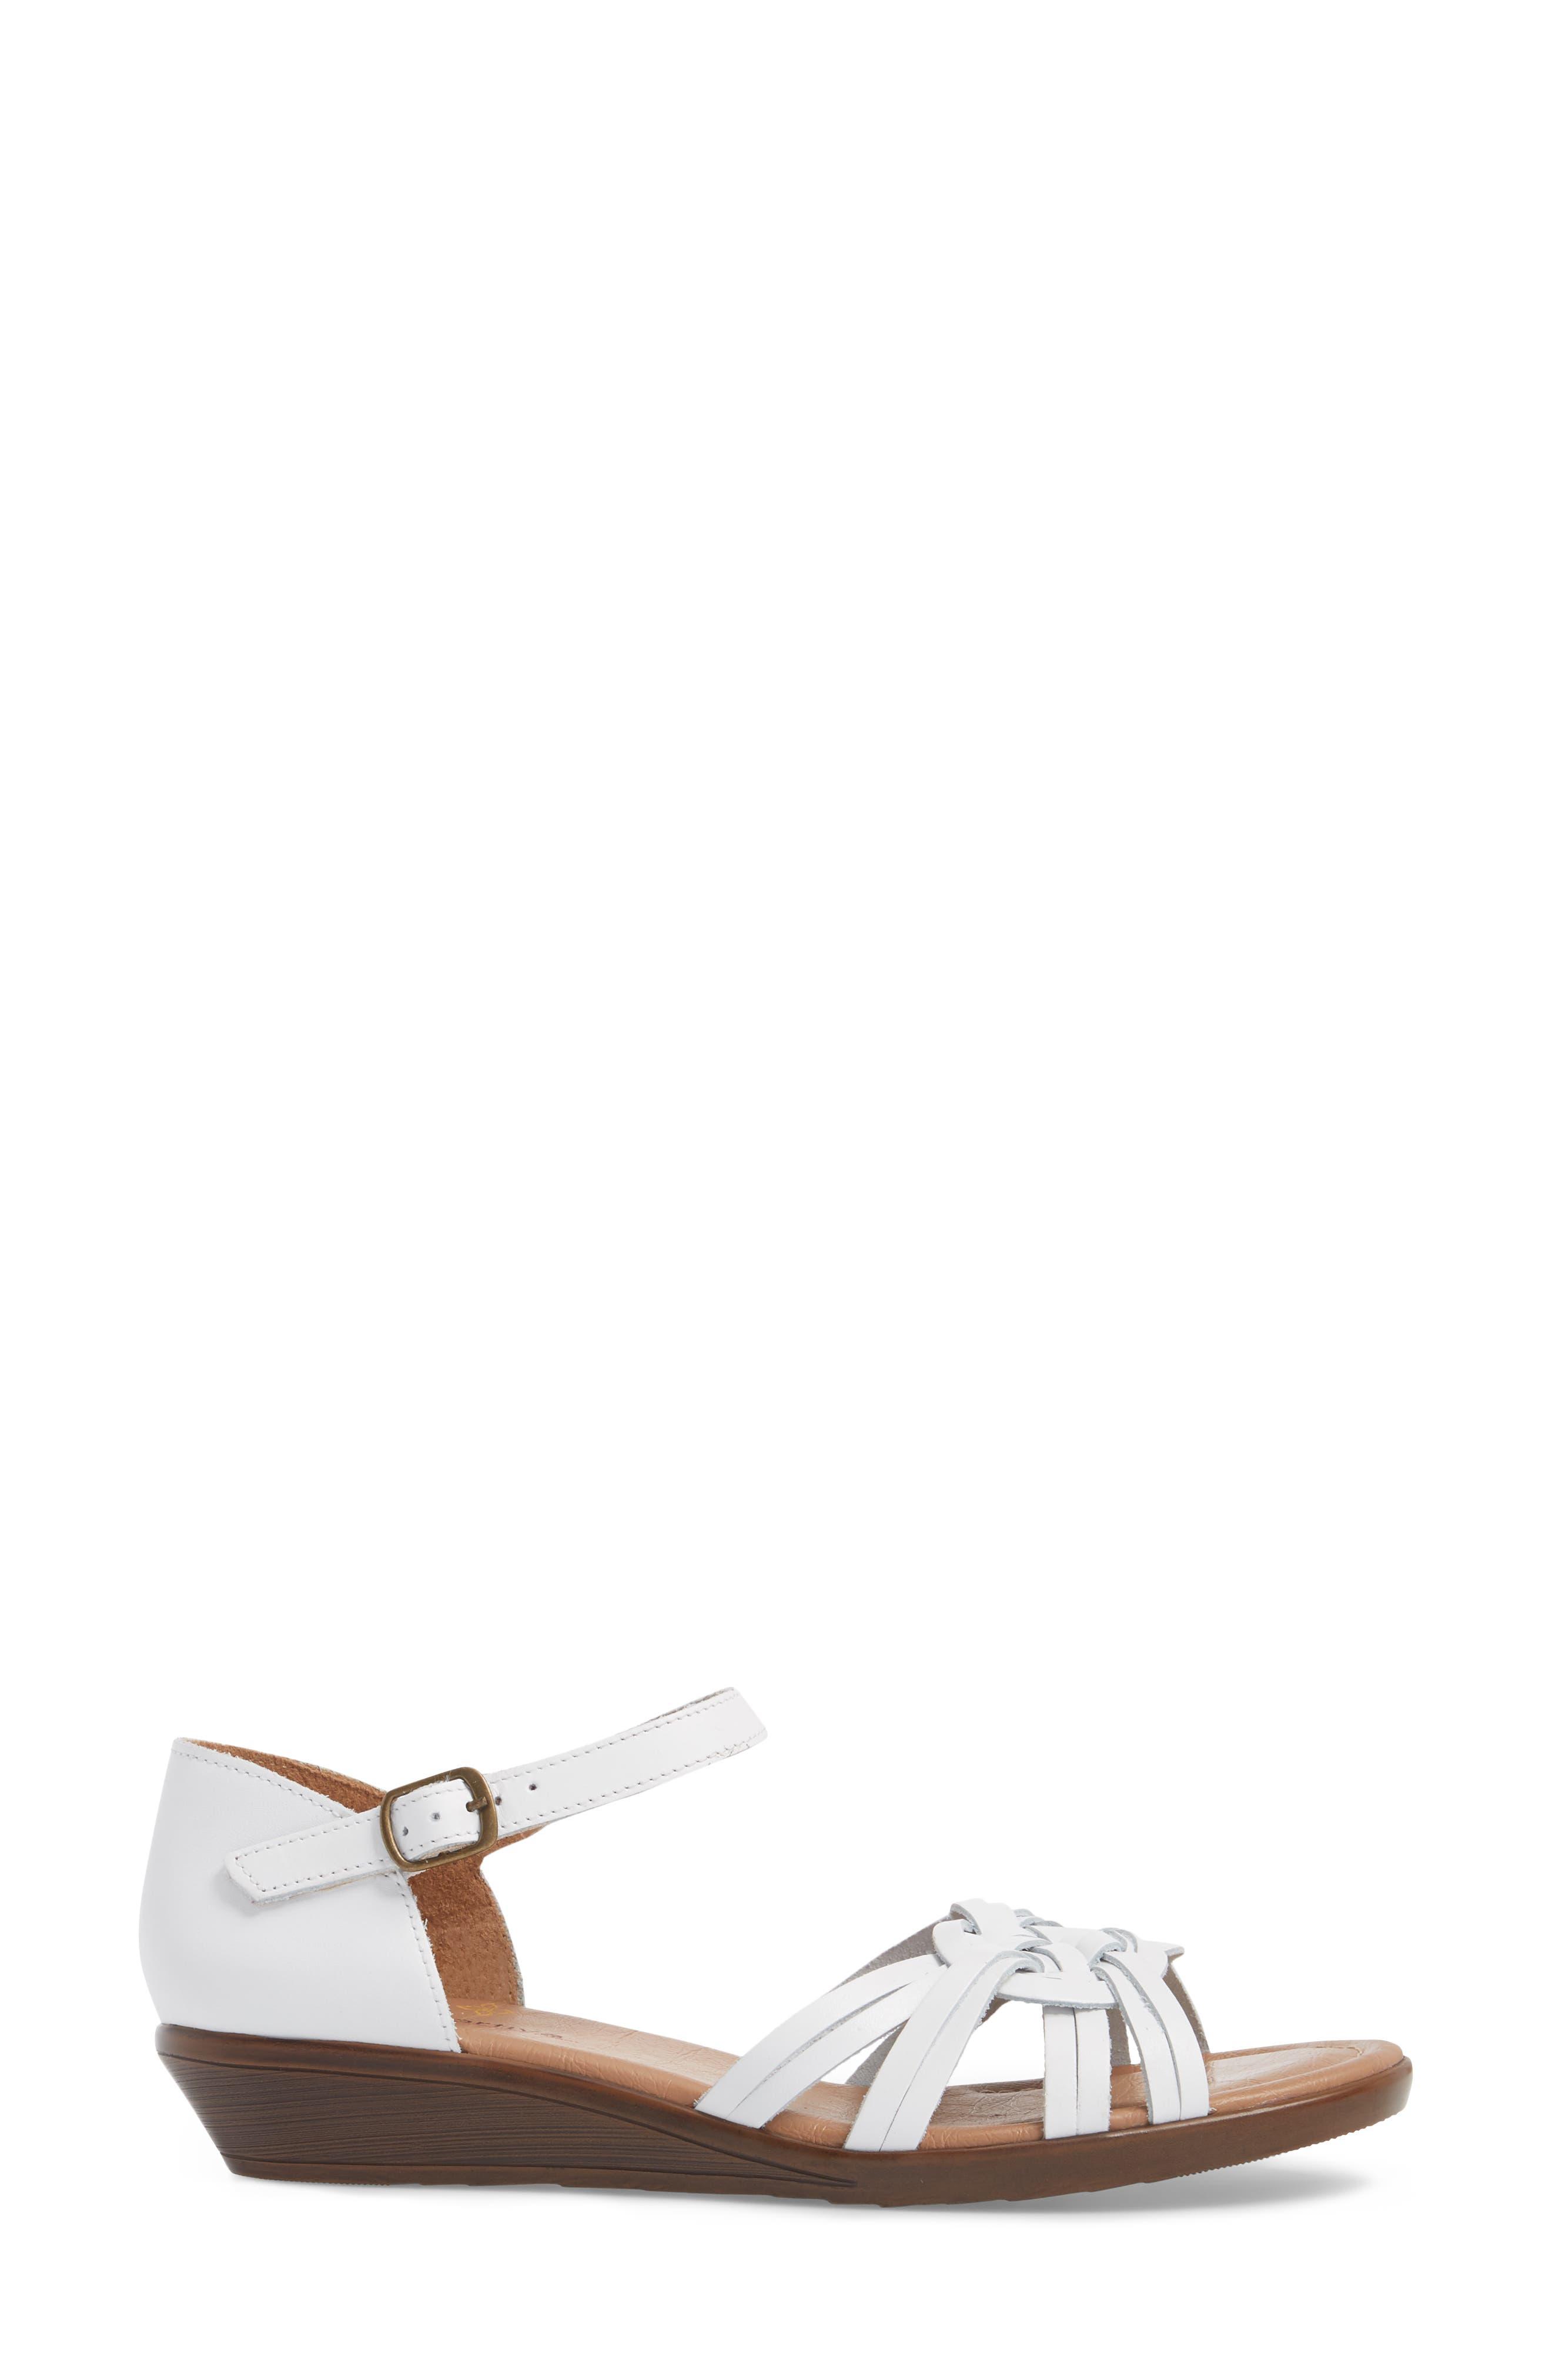 Fortune Sandal,                             Alternate thumbnail 3, color,                             WHITE LEATHER